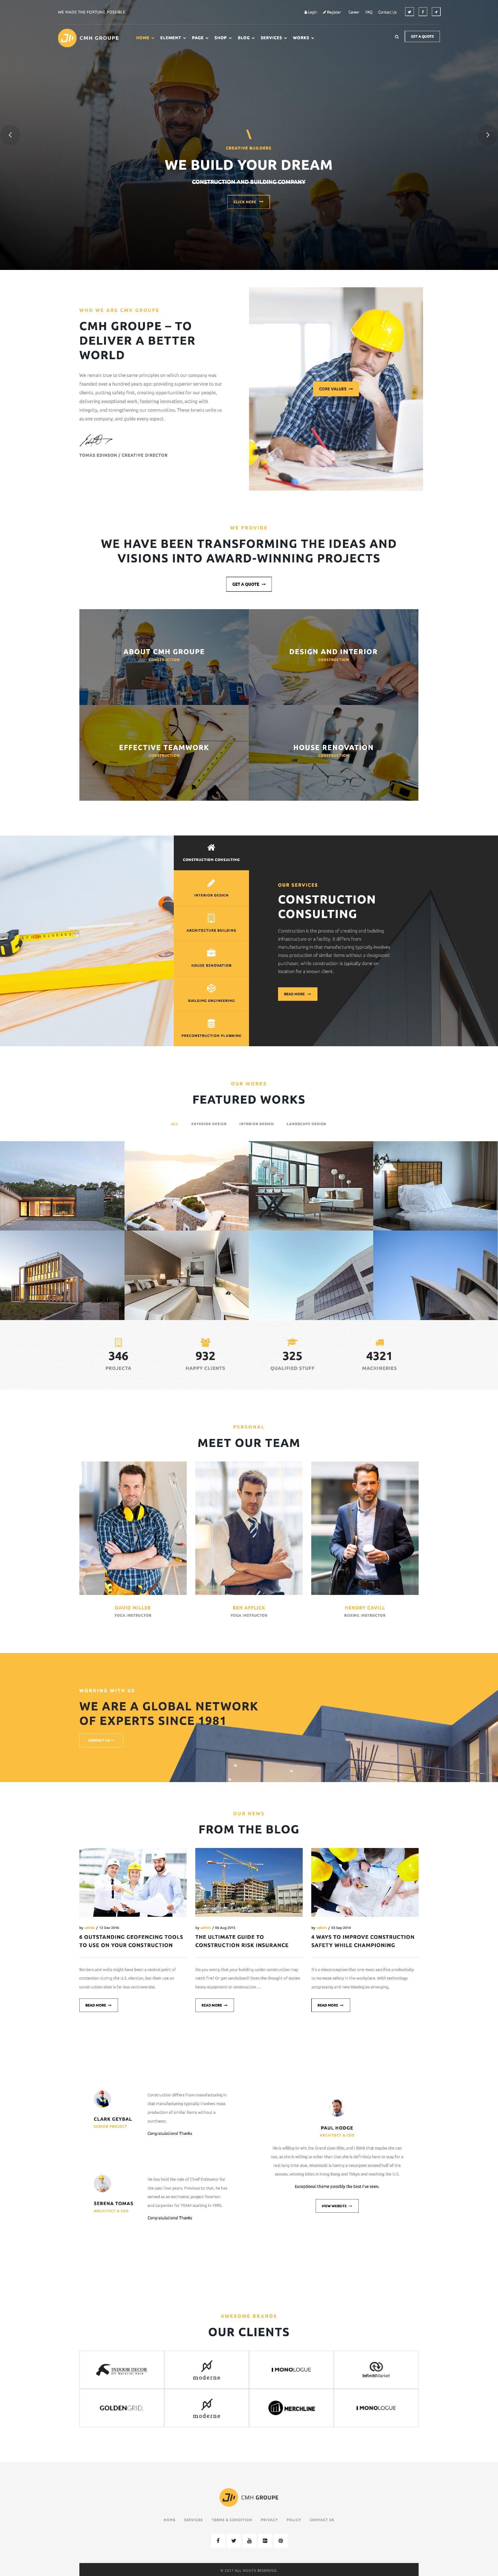 Handyman Website Template Wordpress